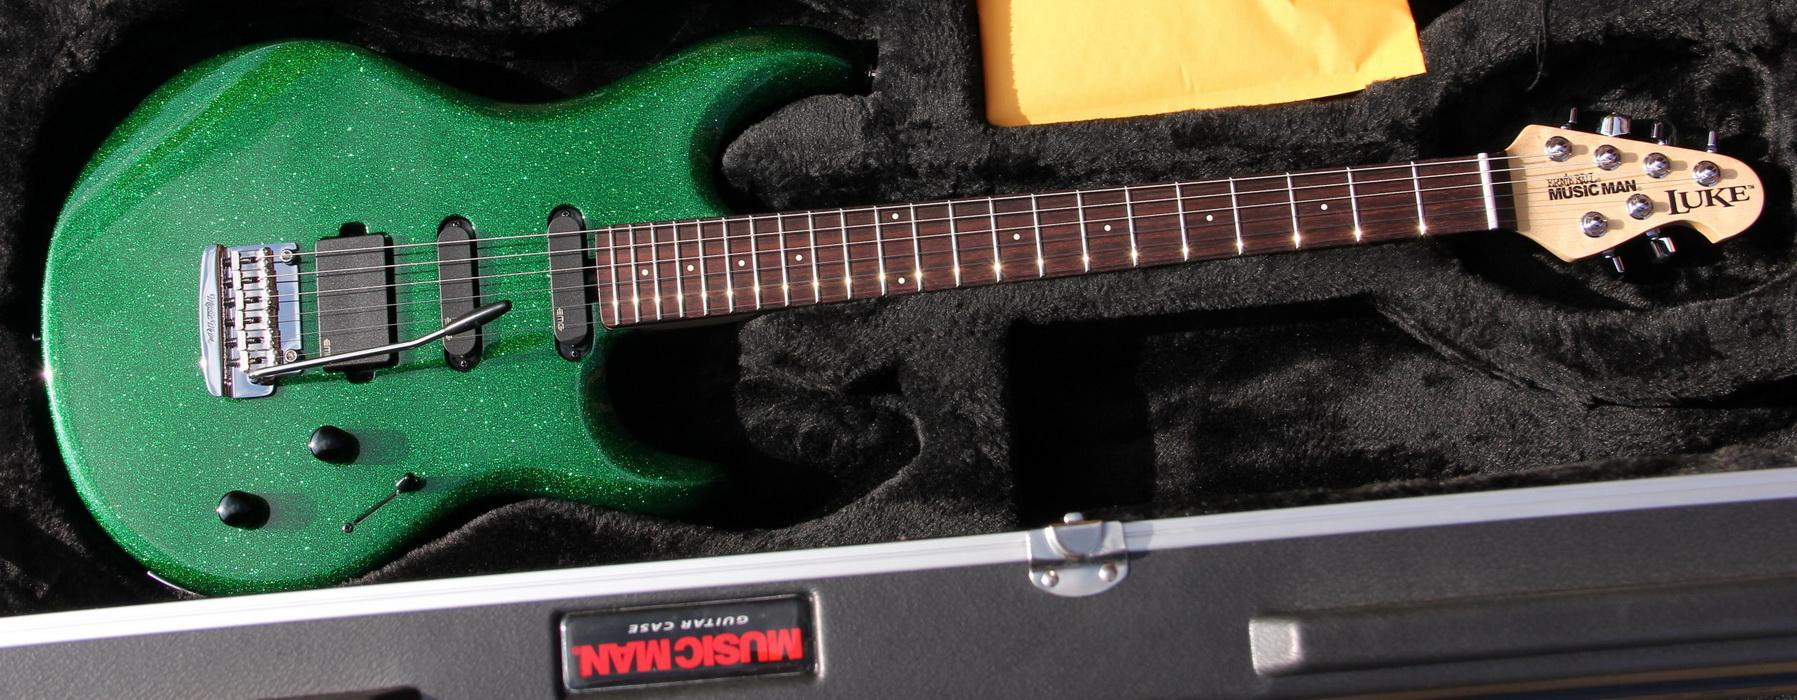 help choix guitare ? LUKE ou VIGIER ???  (résolu :-) ) - Page 2 Original